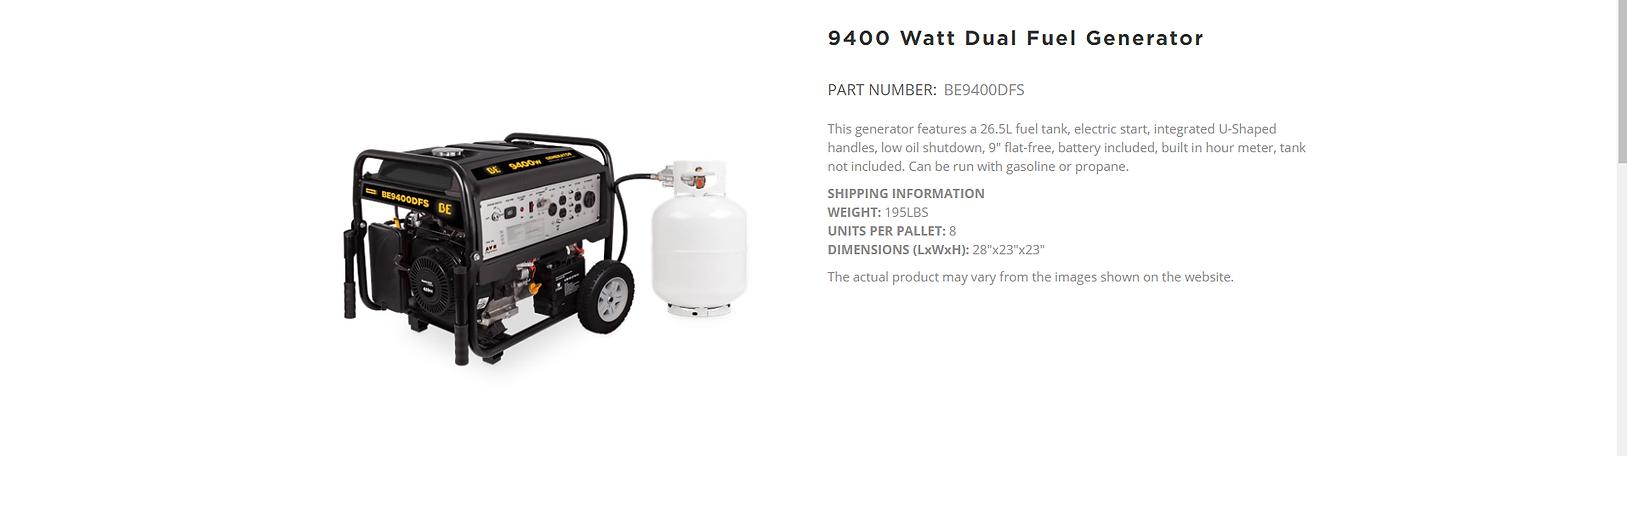 Generator 9400W.png